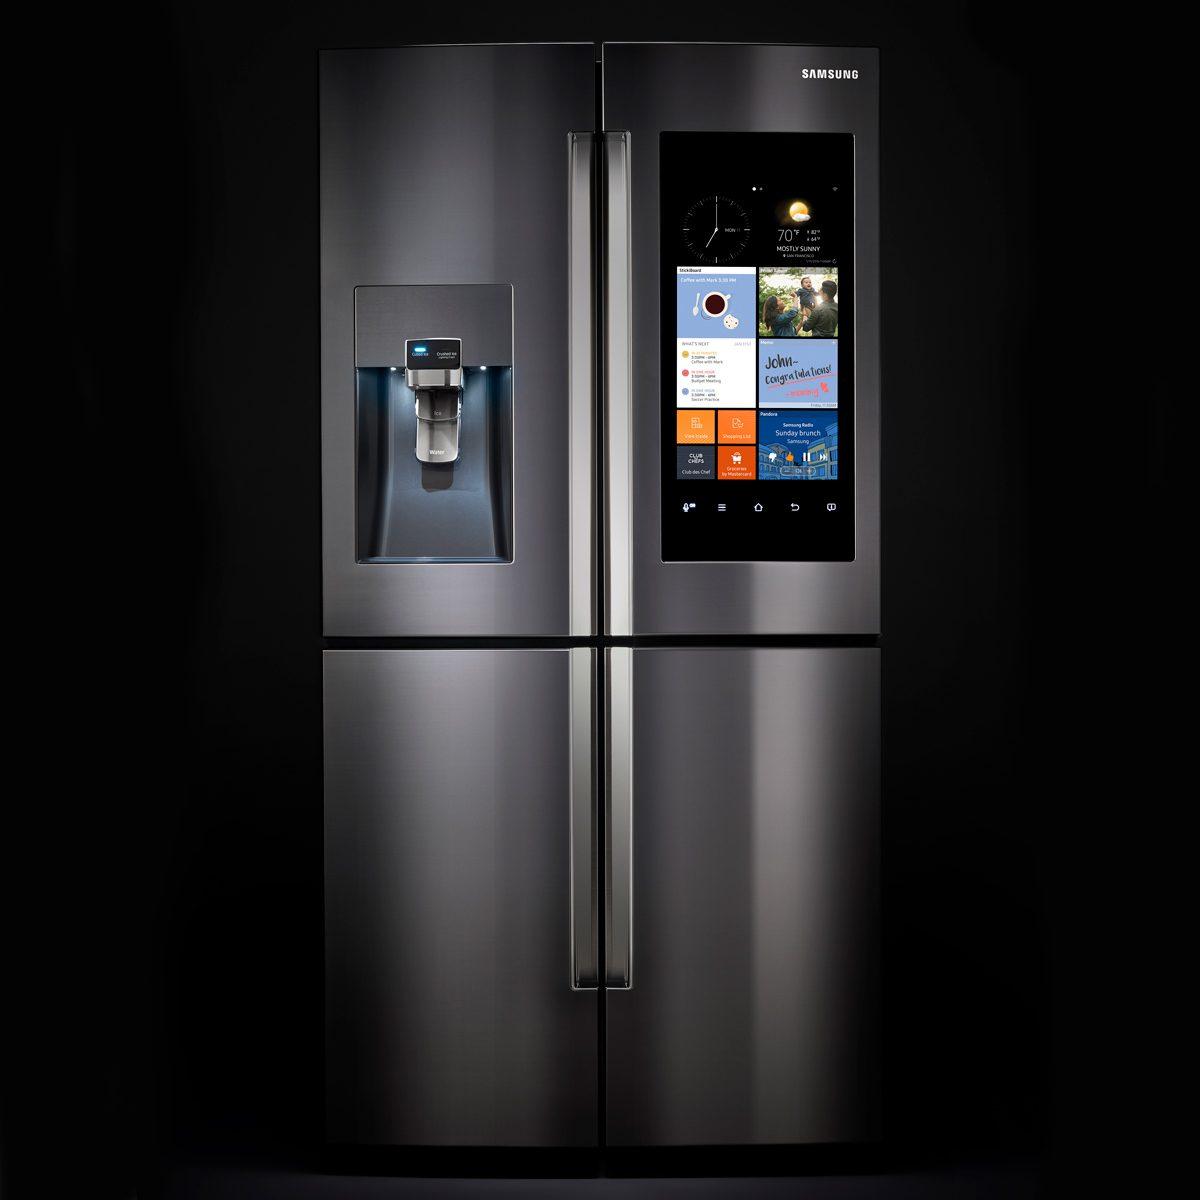 samsungfridge_01 smart appliances fridge